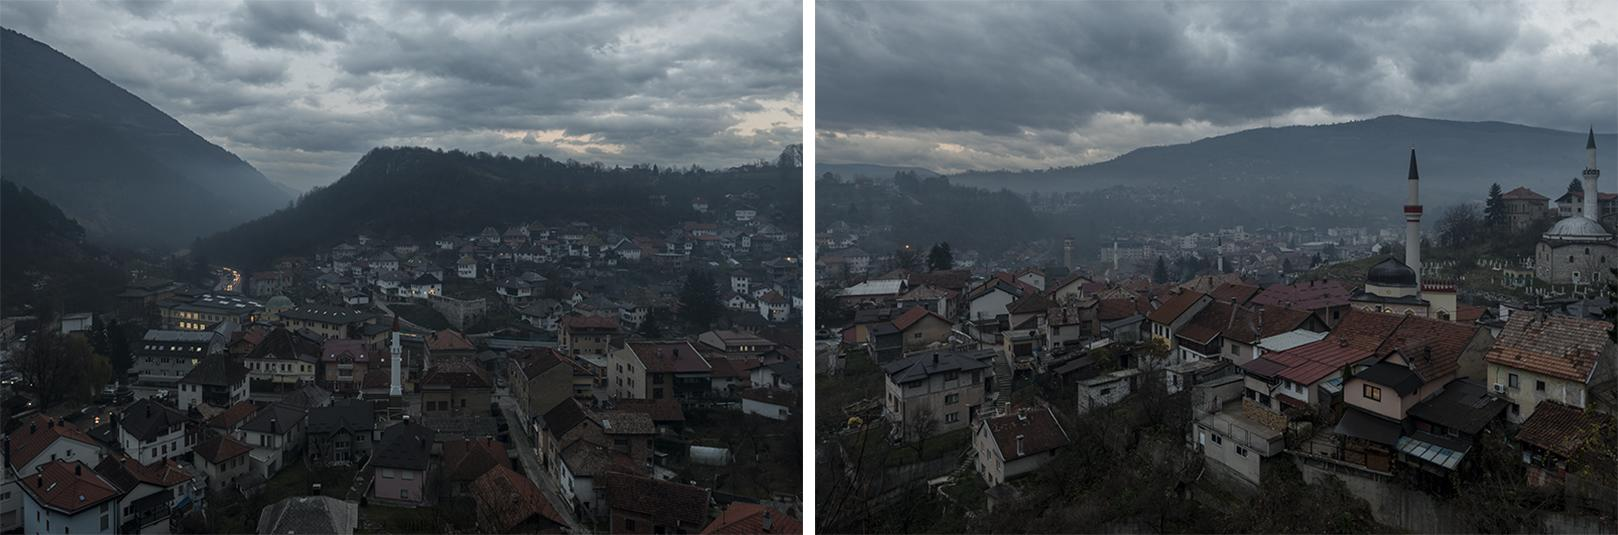 Travnik Dusk (Diptych)